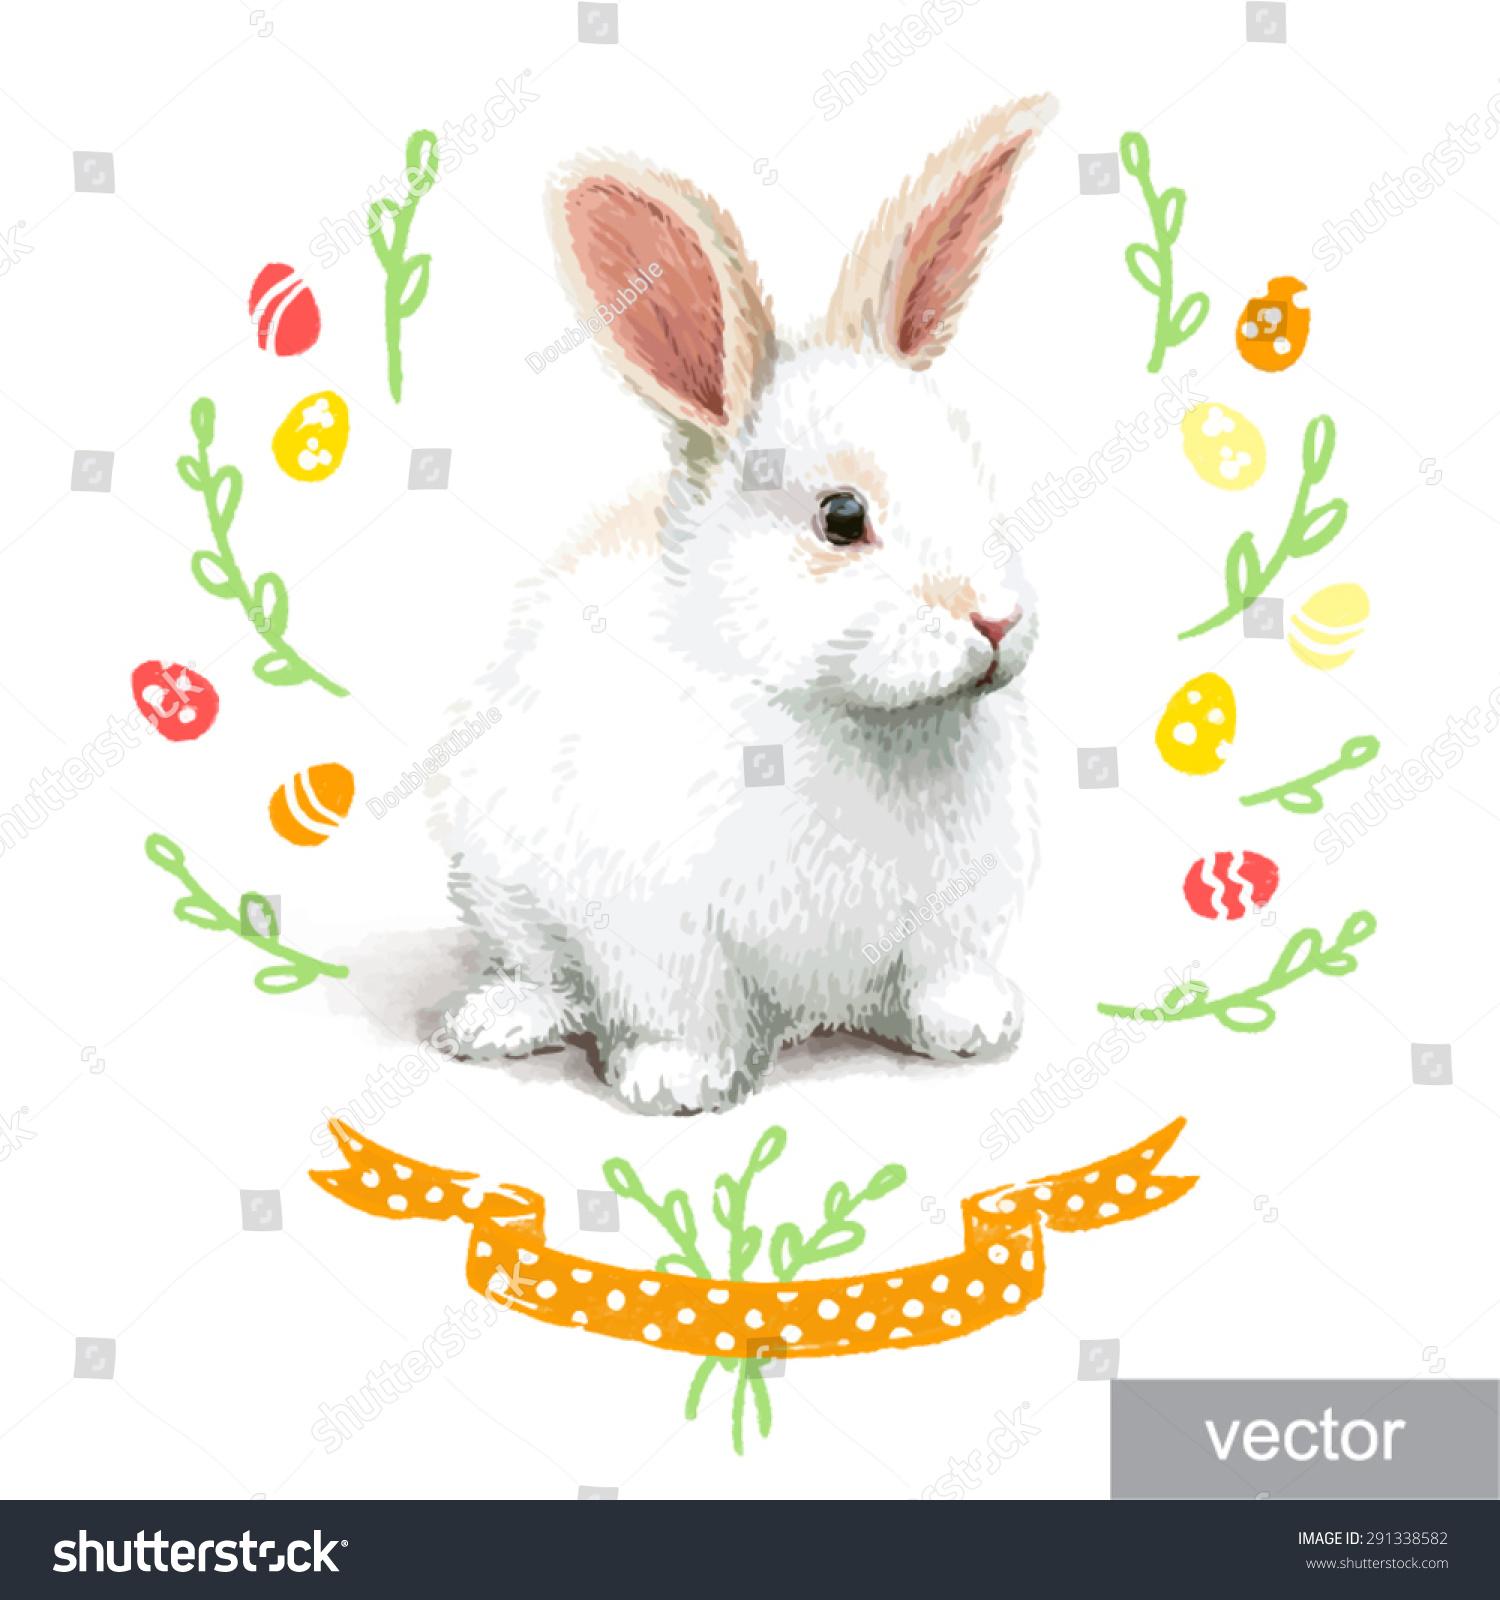 Realistic rabbit illustration - photo#16